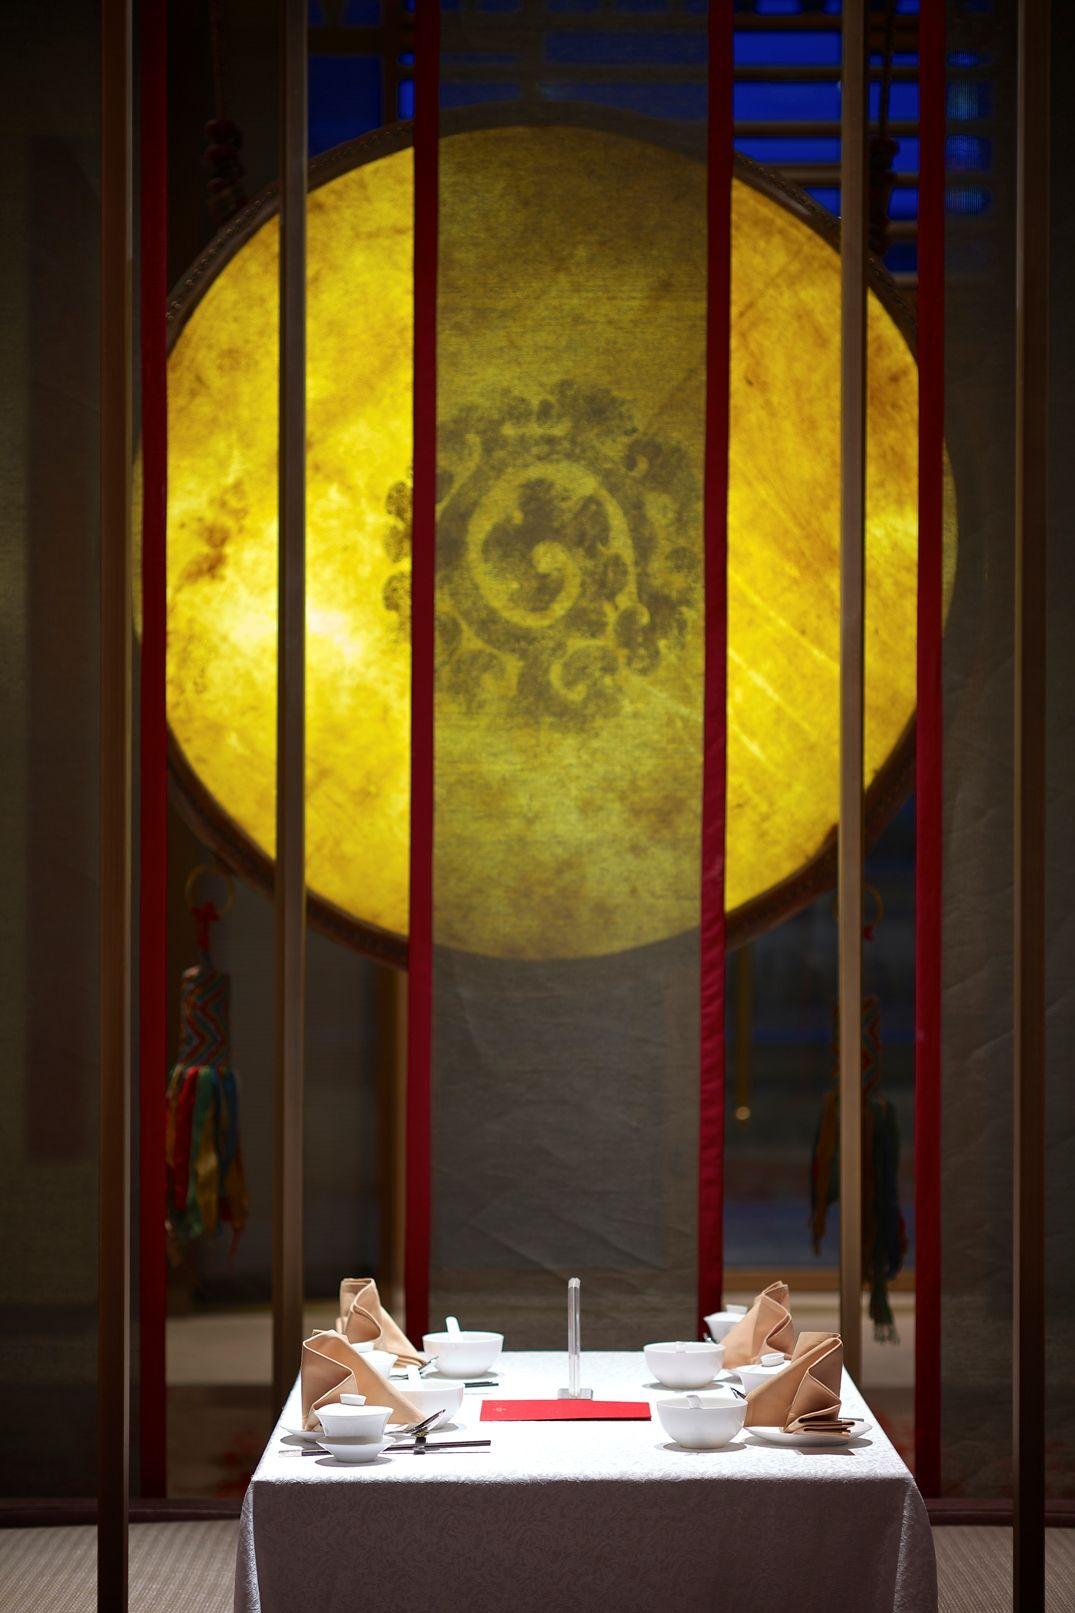 Shang Palace Chinese Restaurant | Shangri-La Lhasa Tibet China ...